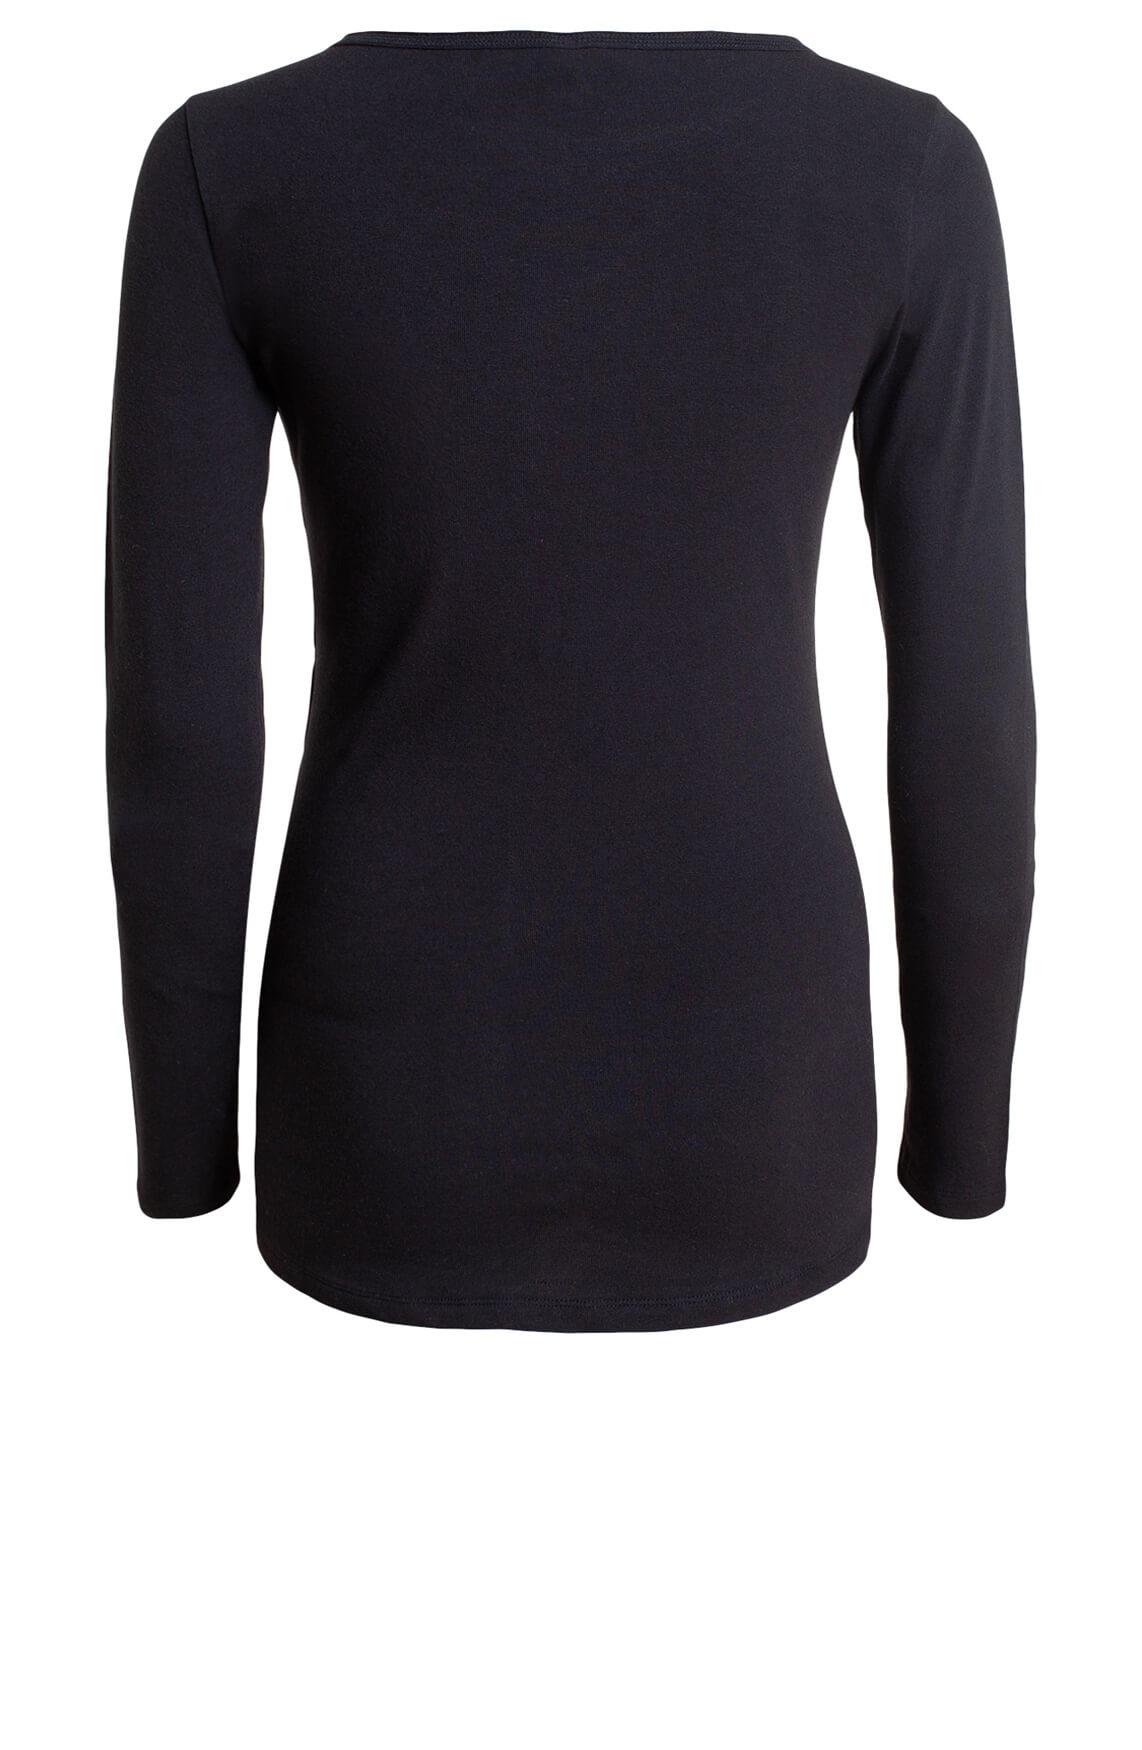 10 Days Dames Slim-fit shirt zwart